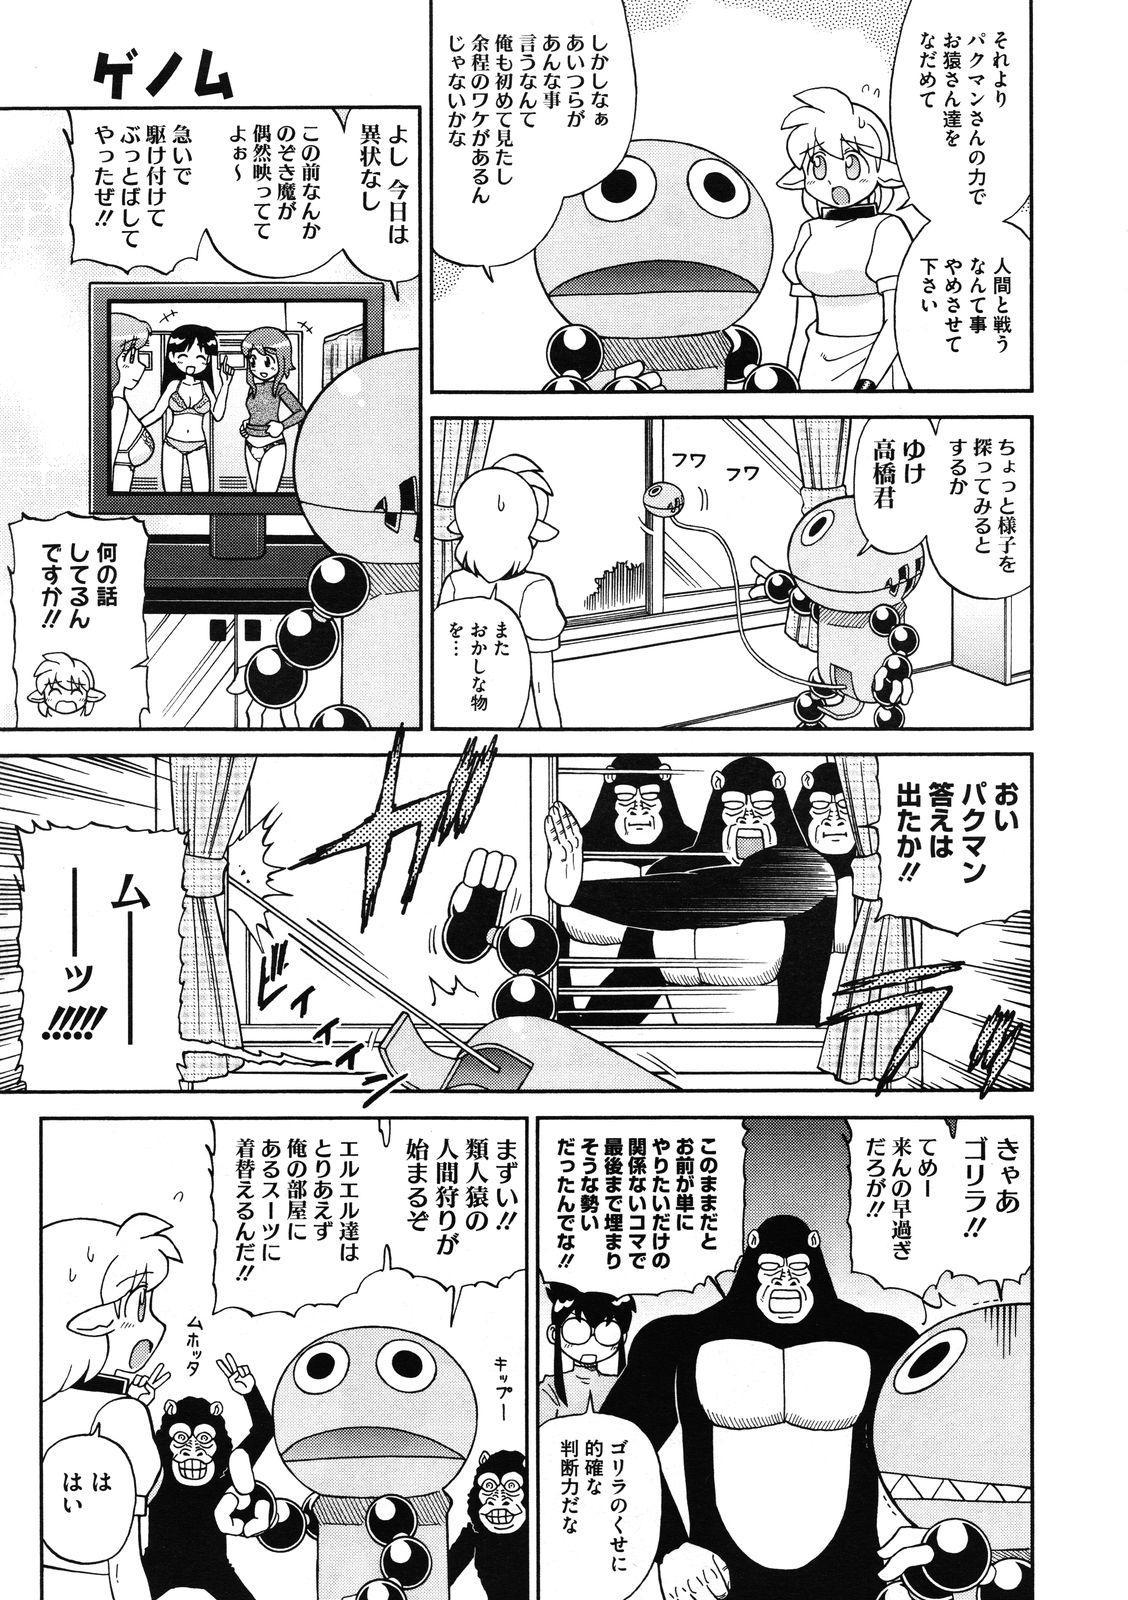 COMIC Megastore 2012-01 498